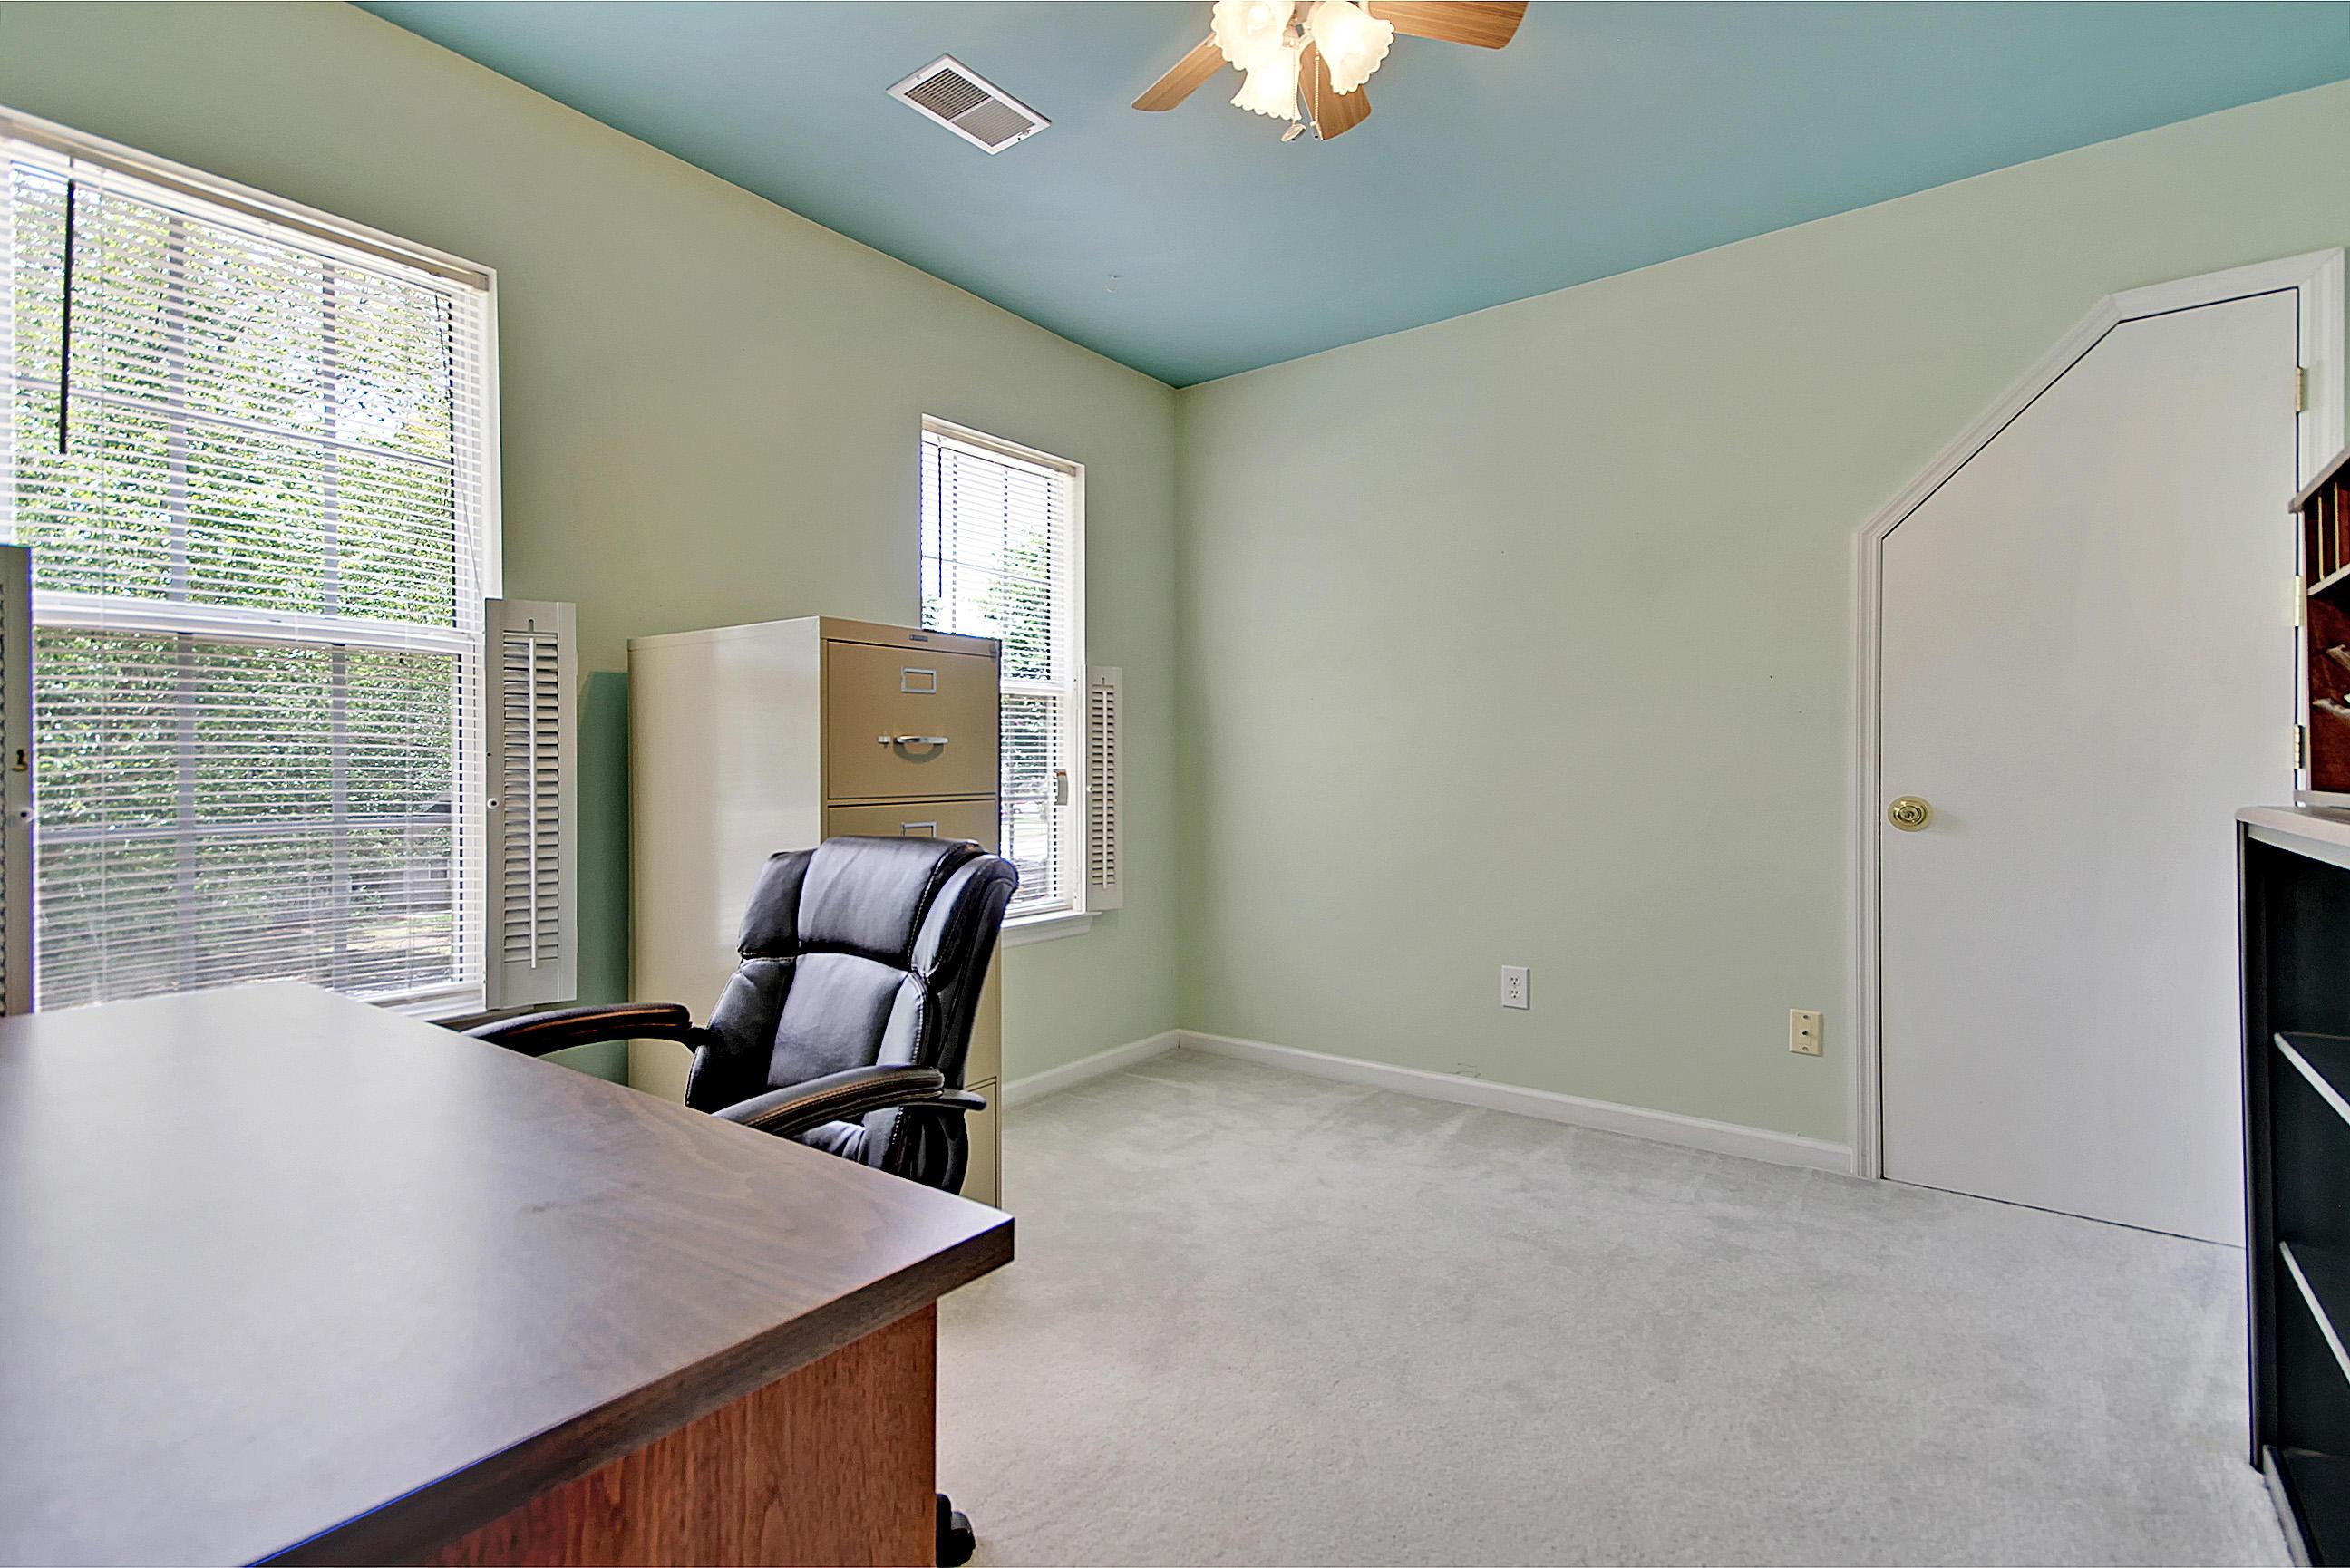 Center Lake Homes For Sale - 1252 Center Lake, Mount Pleasant, SC - 31